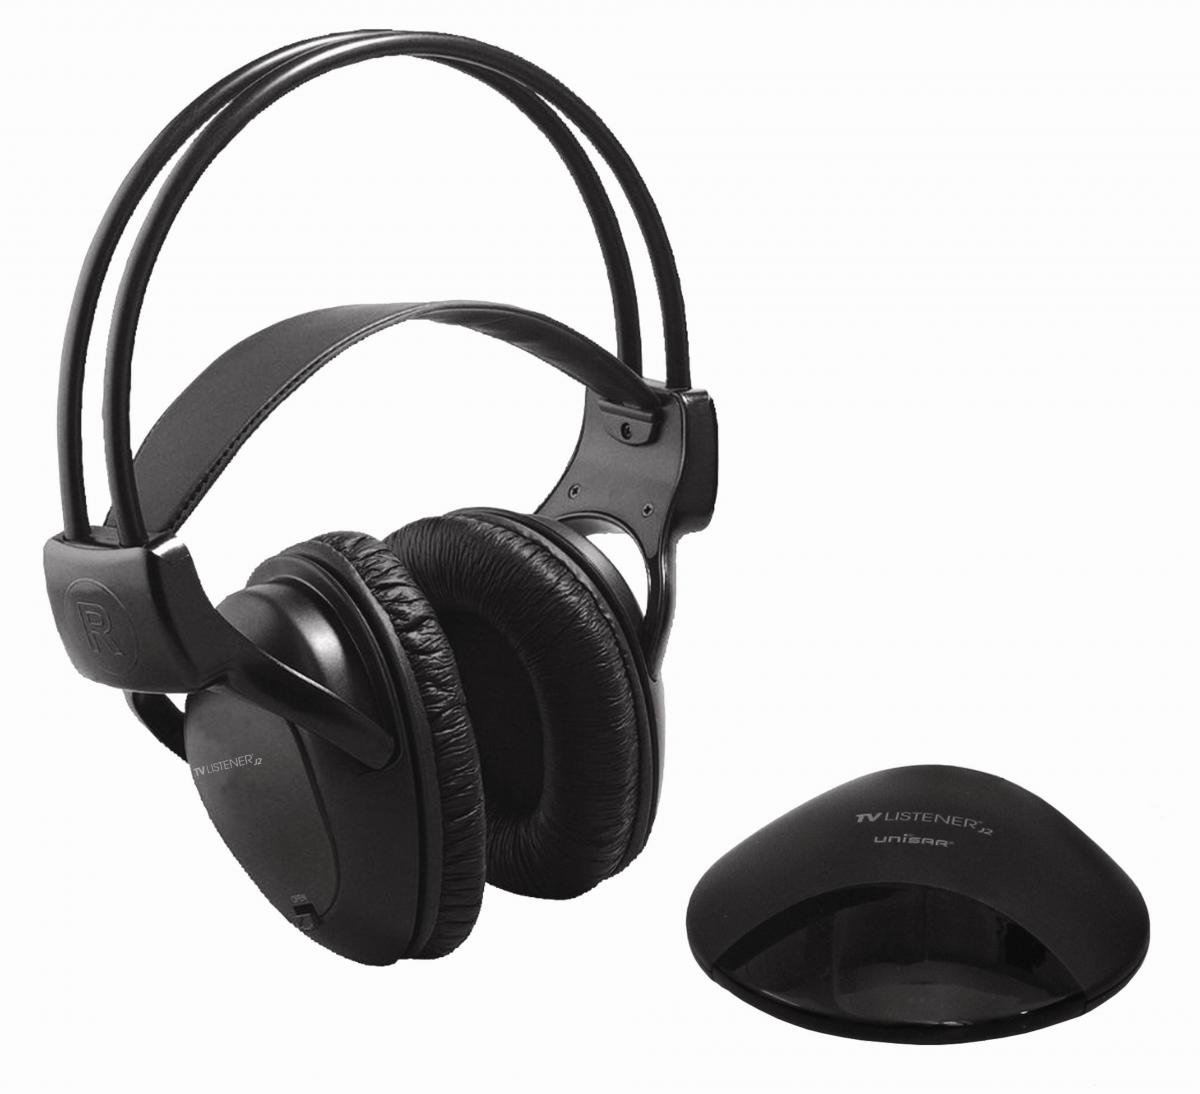 Amazon.com: BEBE SOUND TV Listener J2 Stereo Wireless Headset: Electronics